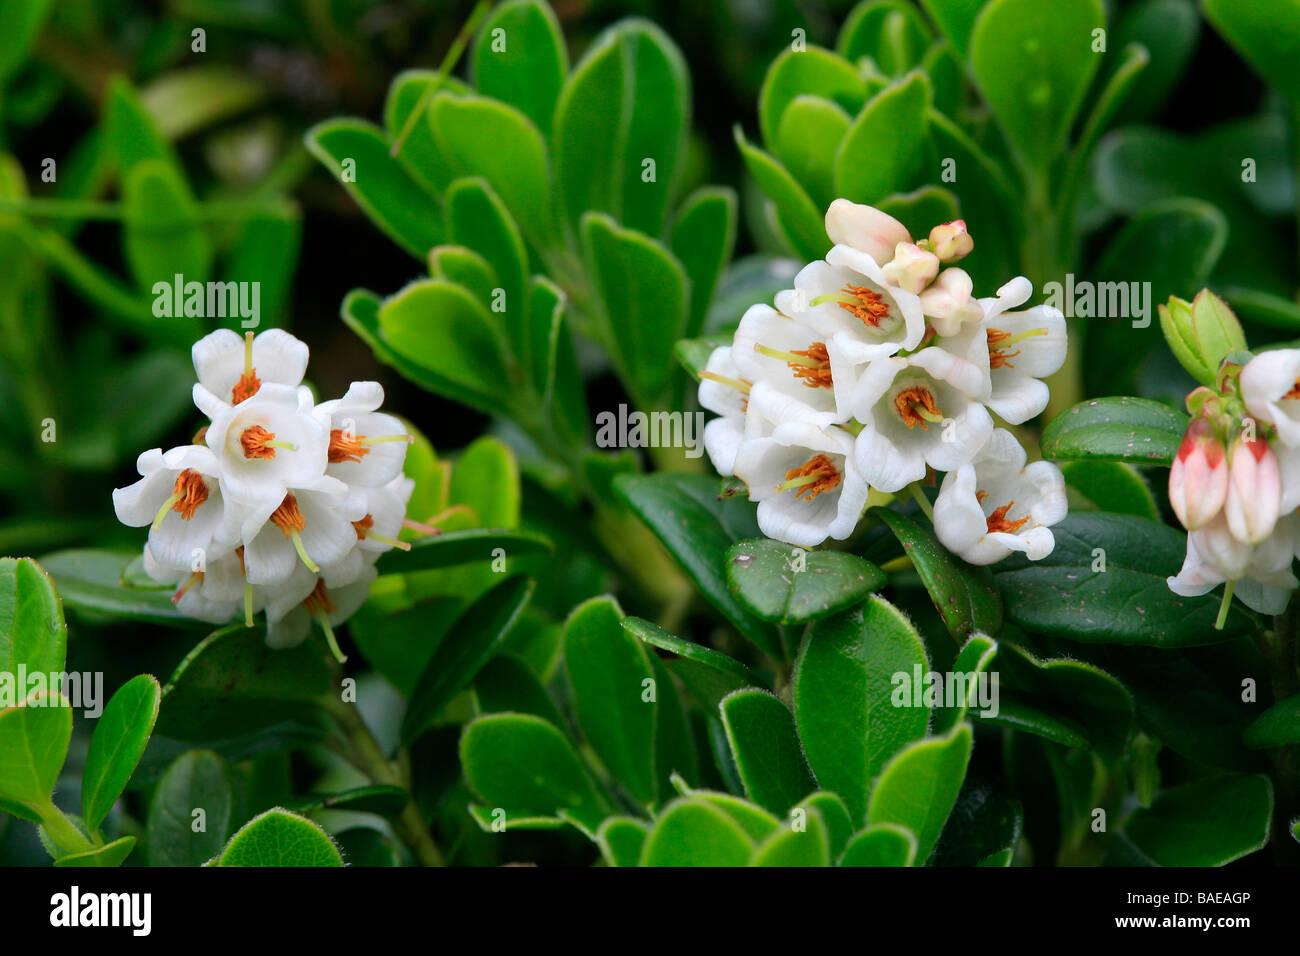 Arctostaphylos uva-ursi - Stock Image